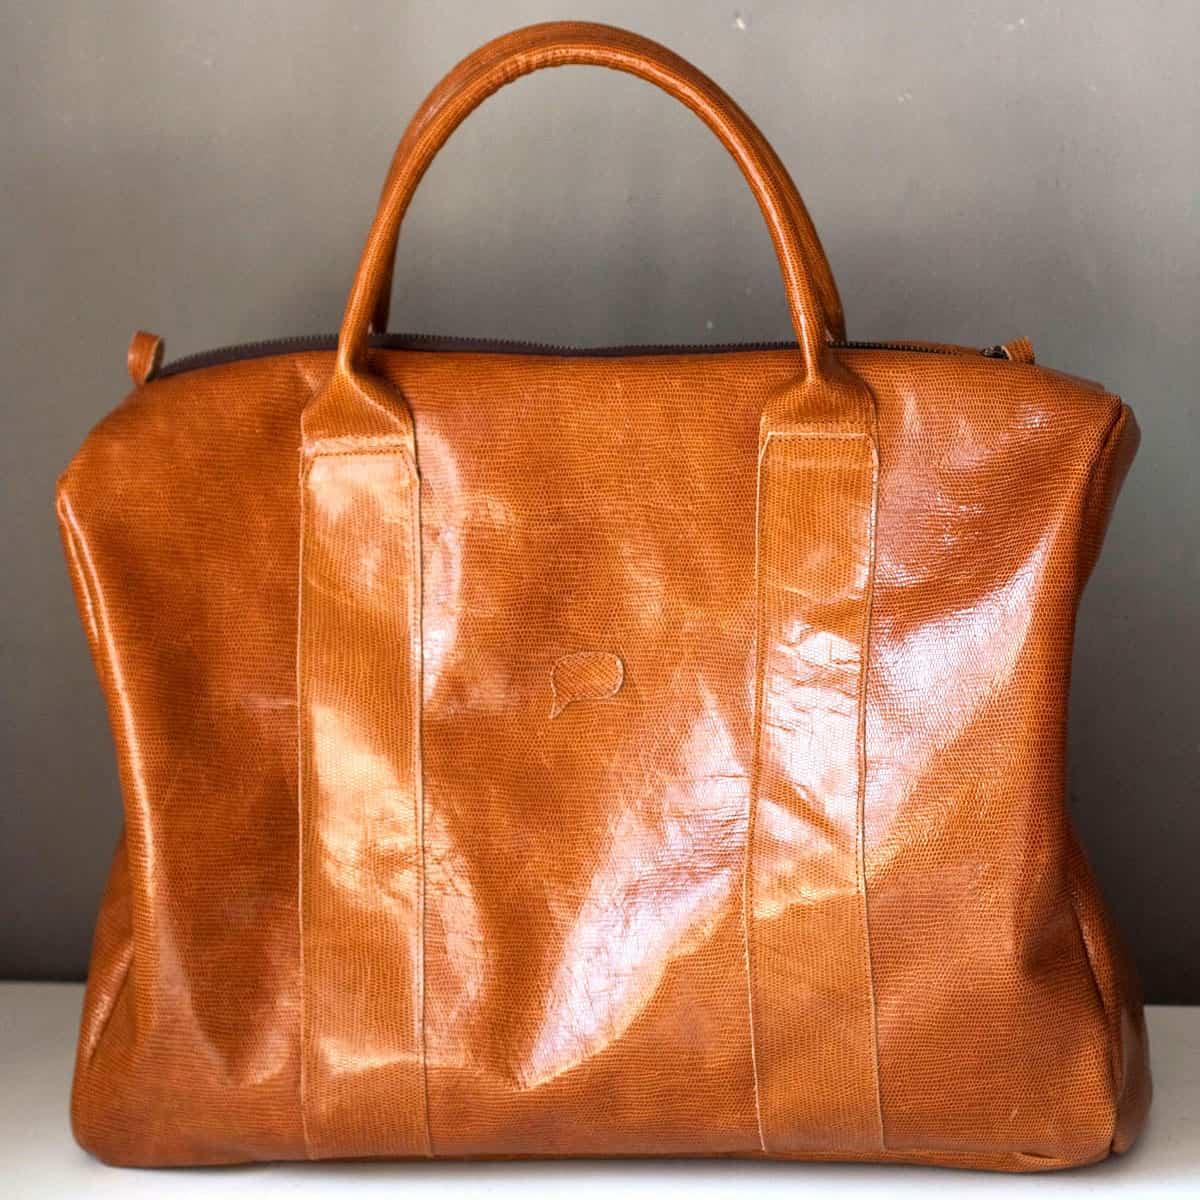 wielka-walizka-skora-1